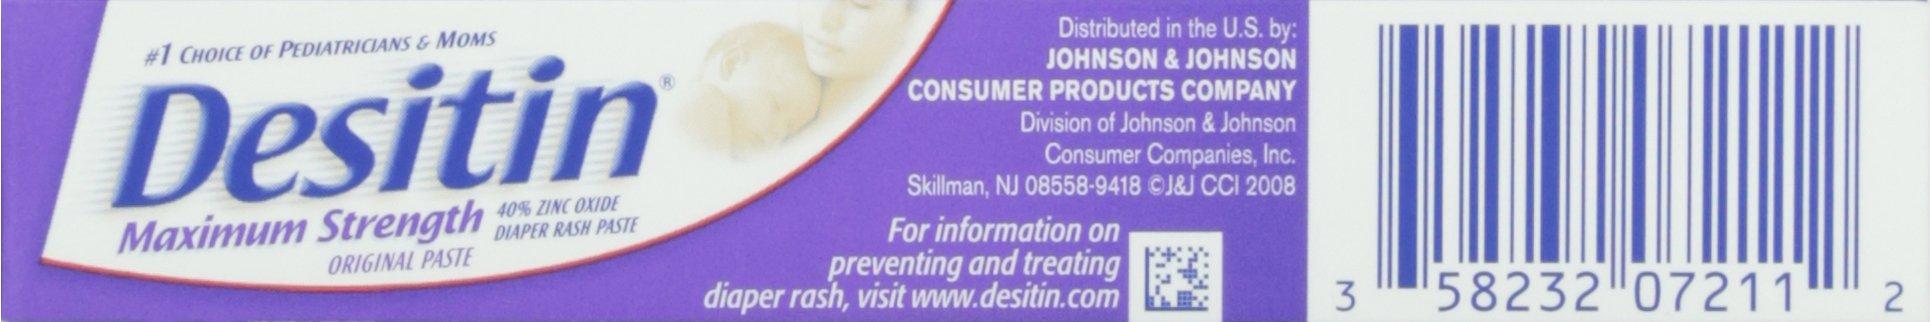 Desitin Diaper Rash Maximum Strength Original Paste, Travel Size, 1 Oz. Tube (Pack of 6) by Desitin (Image #5)